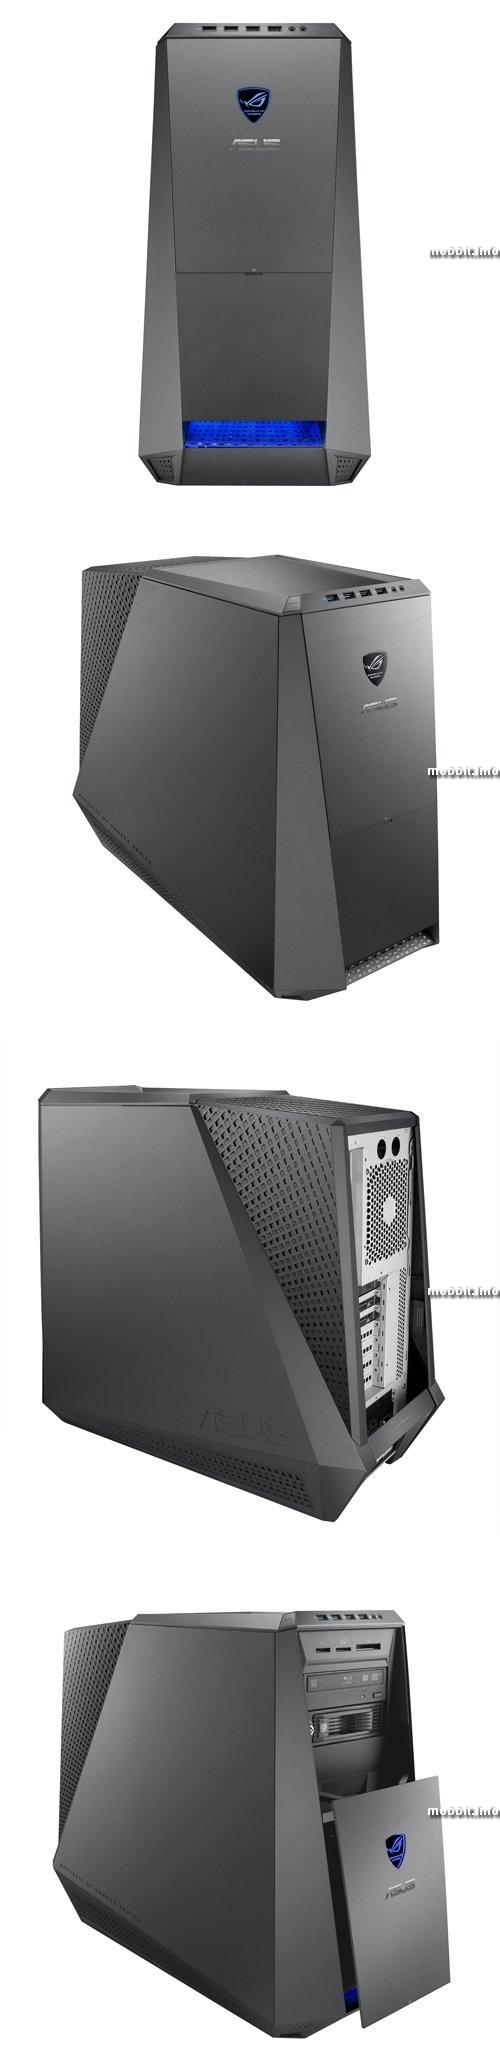 CG8580